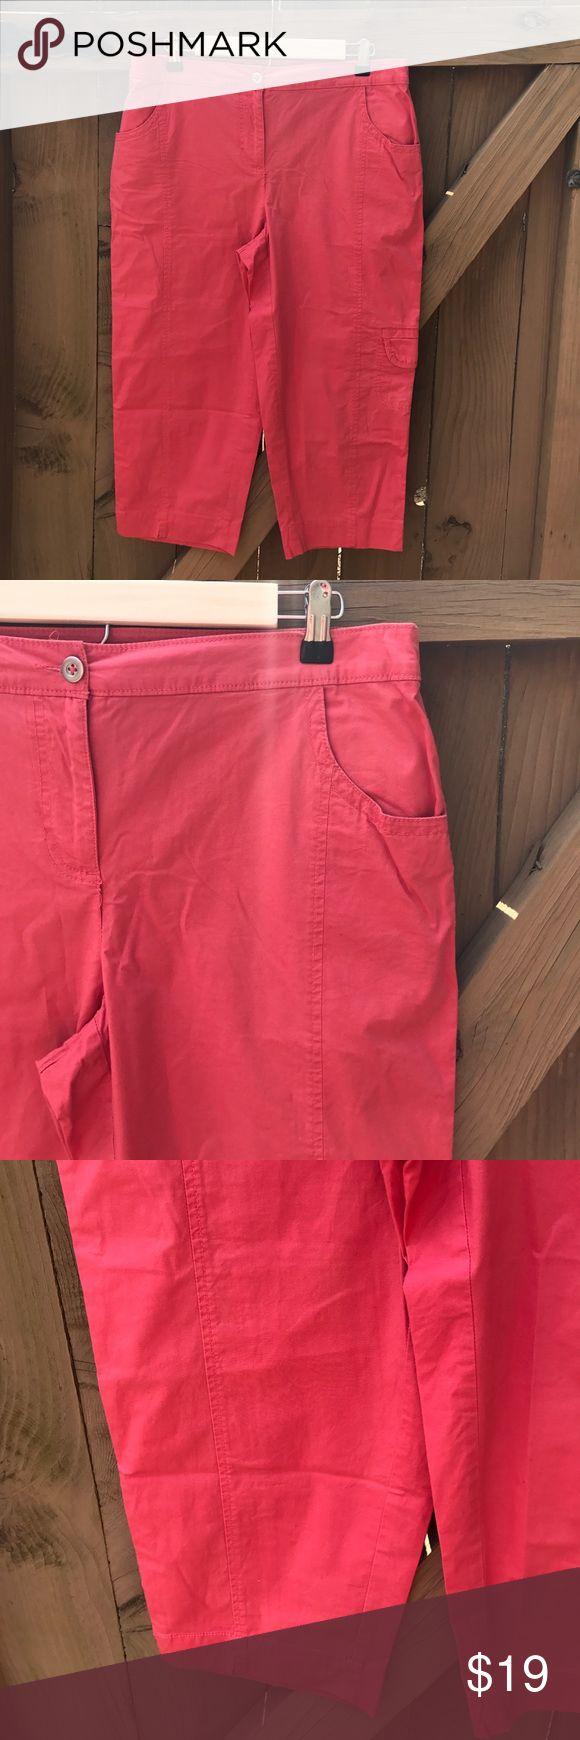 Chico's size 1 (M/8) coral capri pants Chico's size 1 (M/8) coral capri pants Chico's Pants Capris